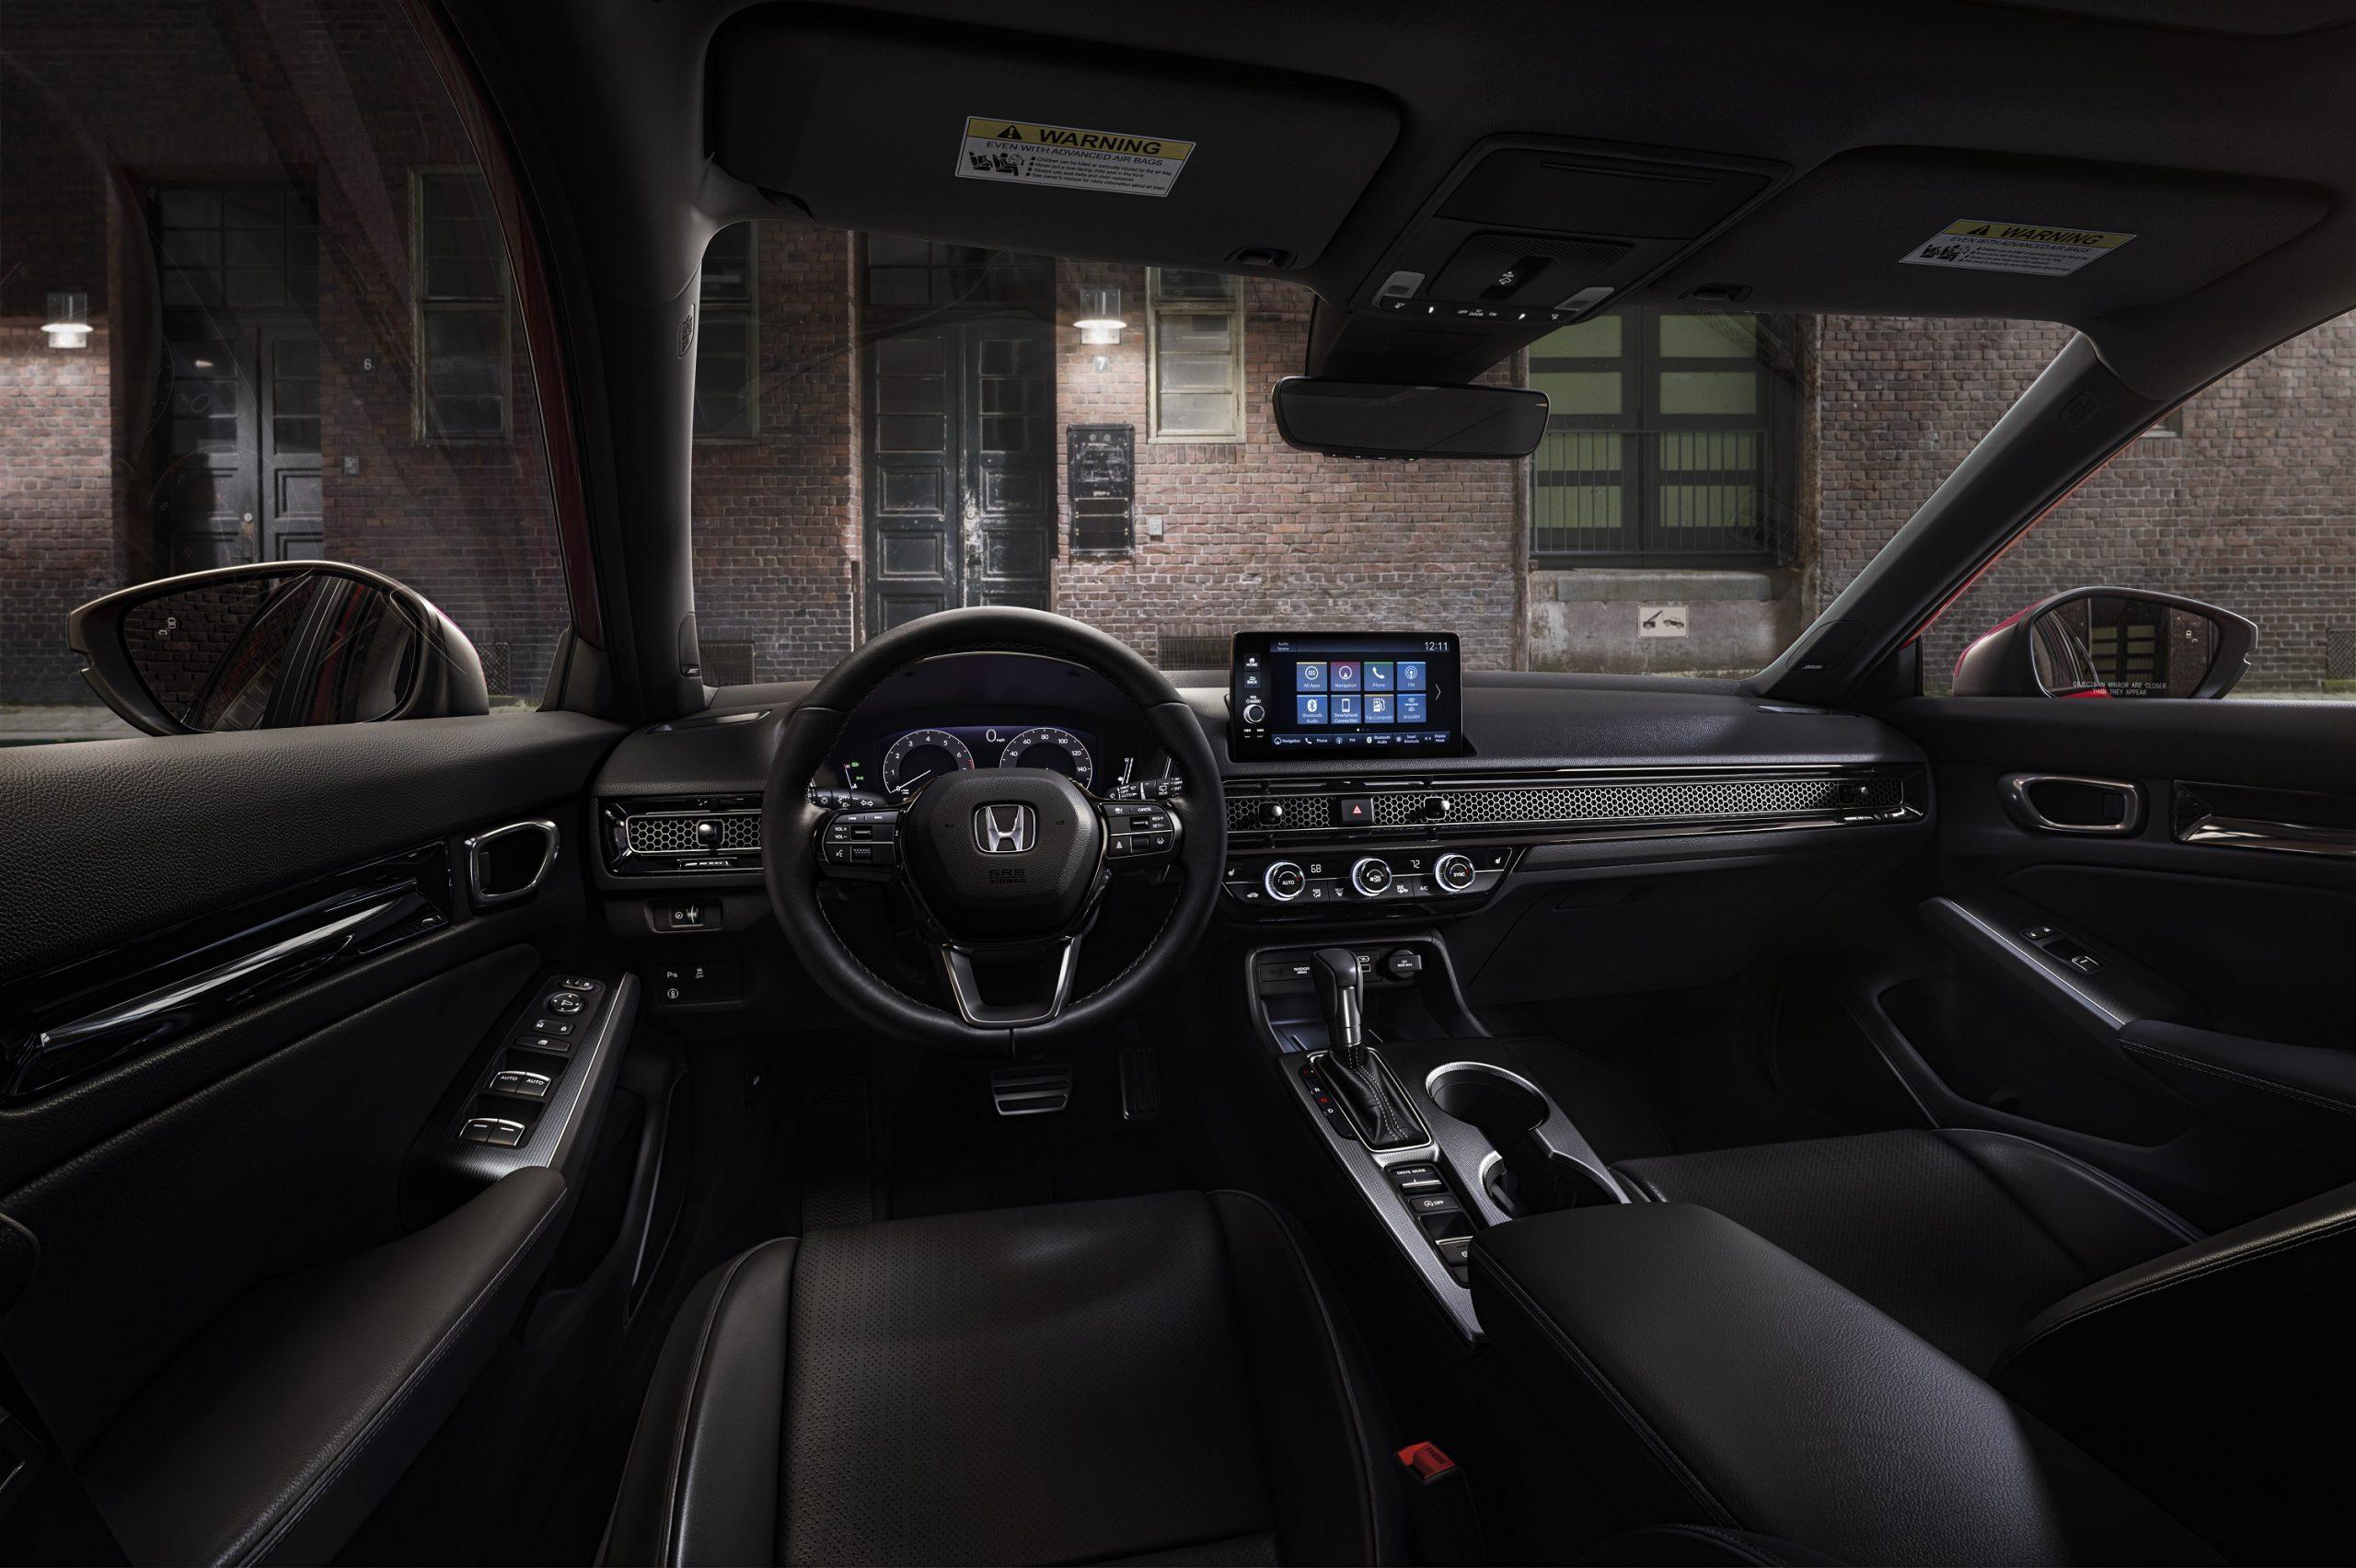 The 2022 Honda Civic interior shot from the driver's seat at night